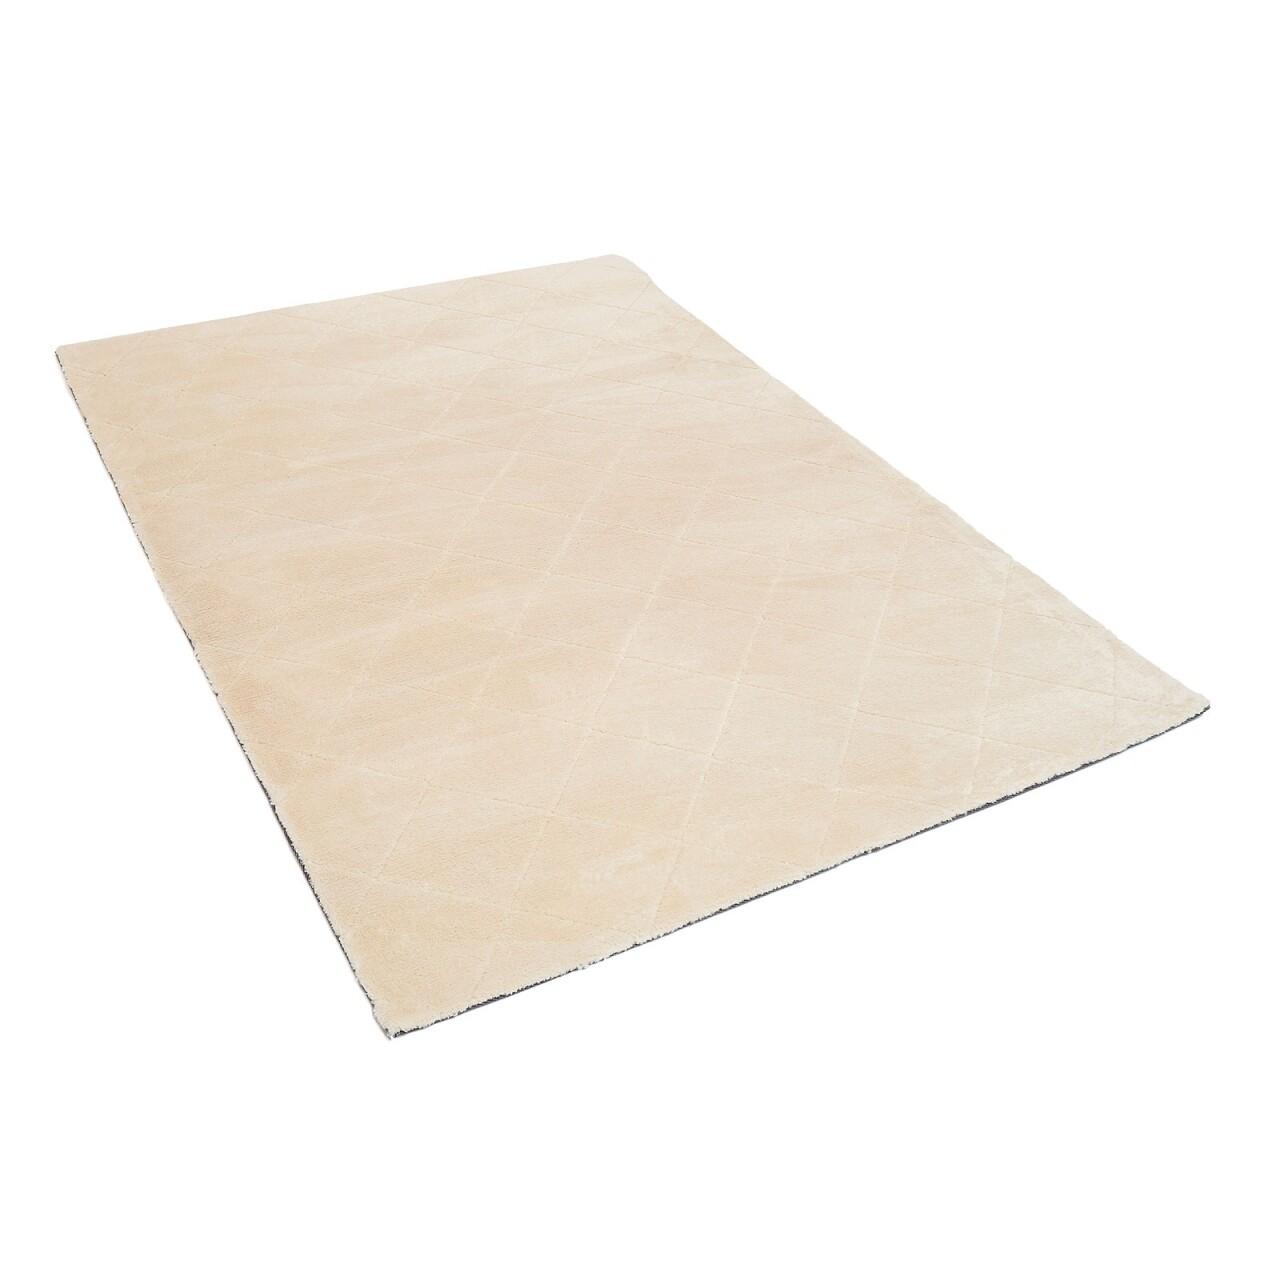 Covor Shaggy Soft, Heinner, 50 x 90 cm, 100% poliester, bej